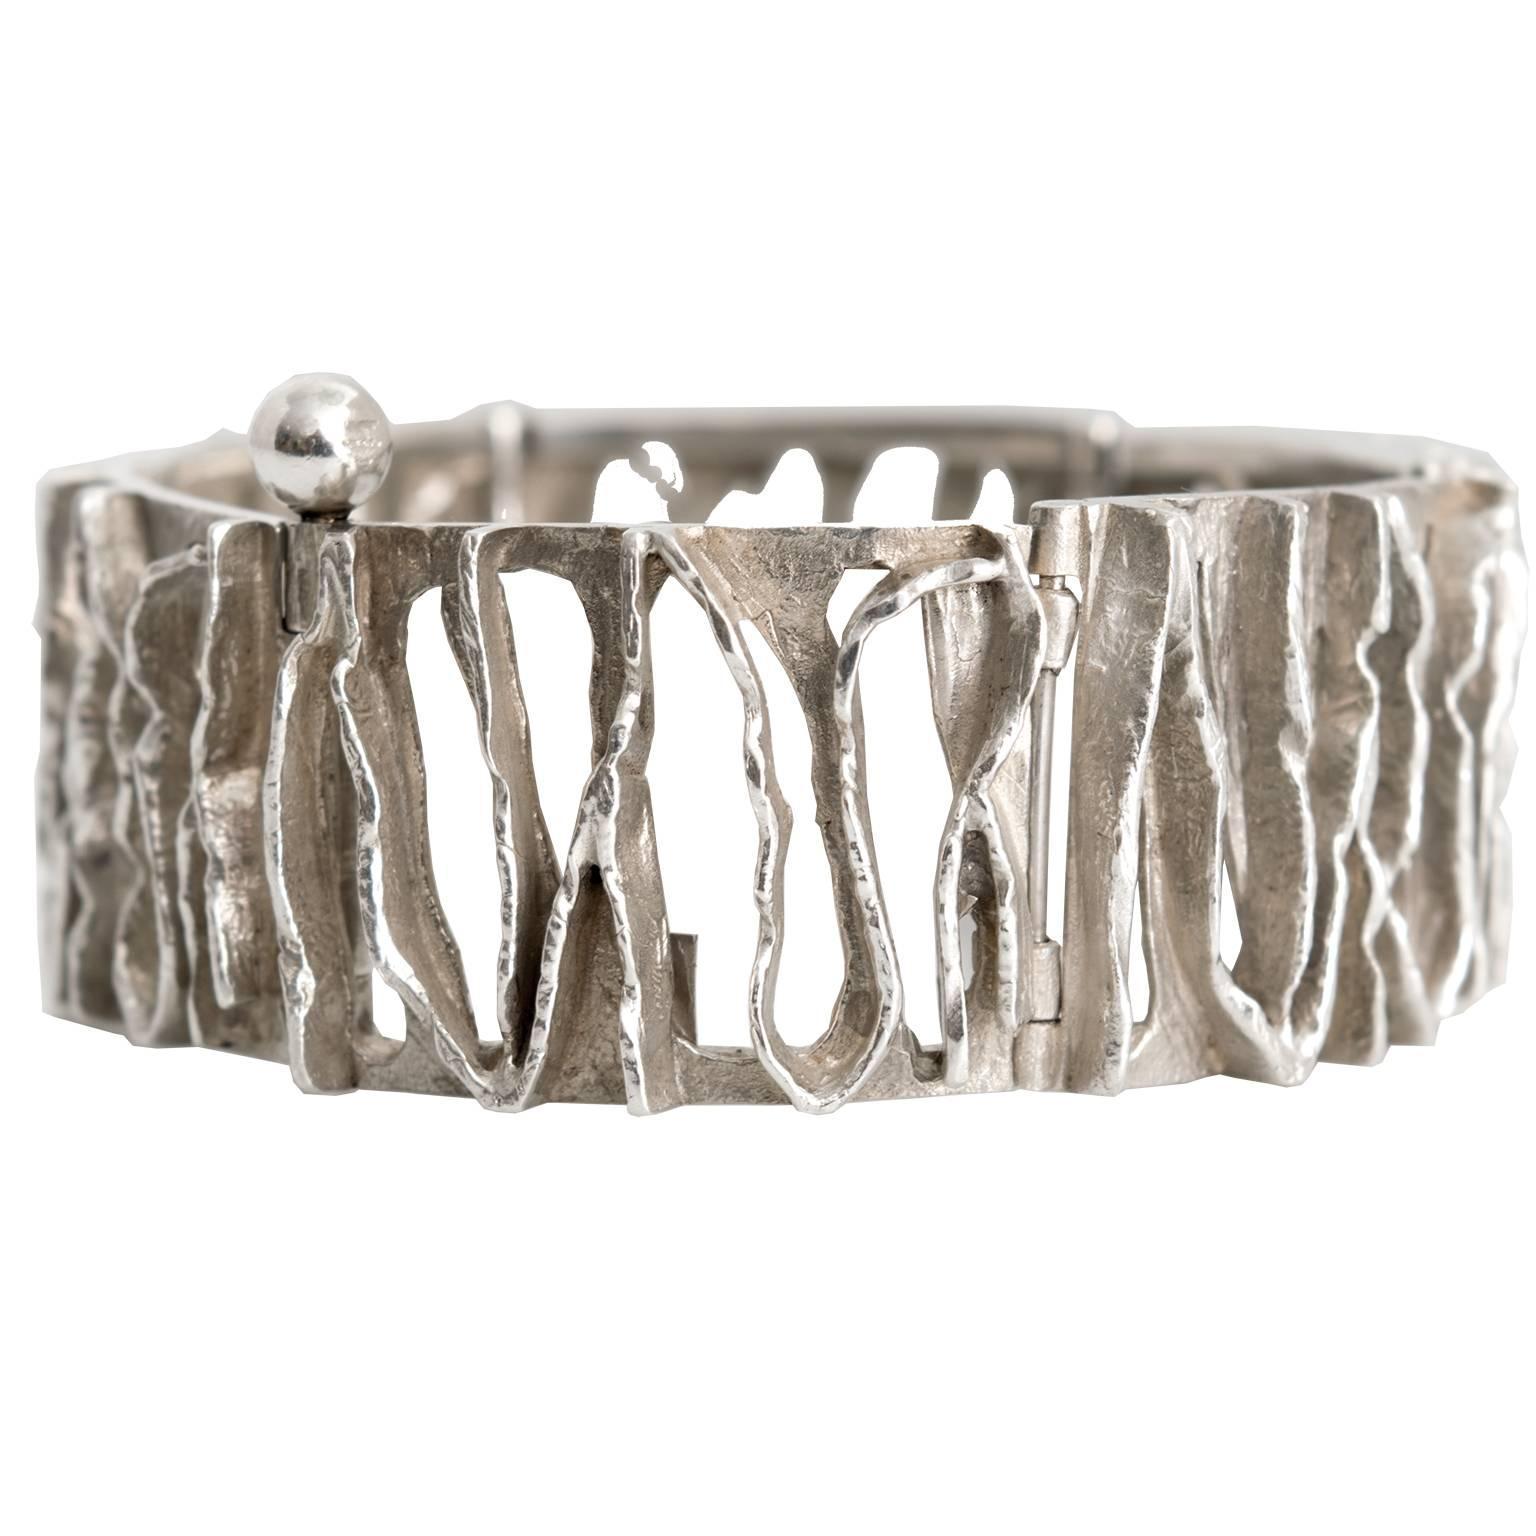 Scandinavian Modern Silver Bracelet from C. Holm, Denmark, 1950s